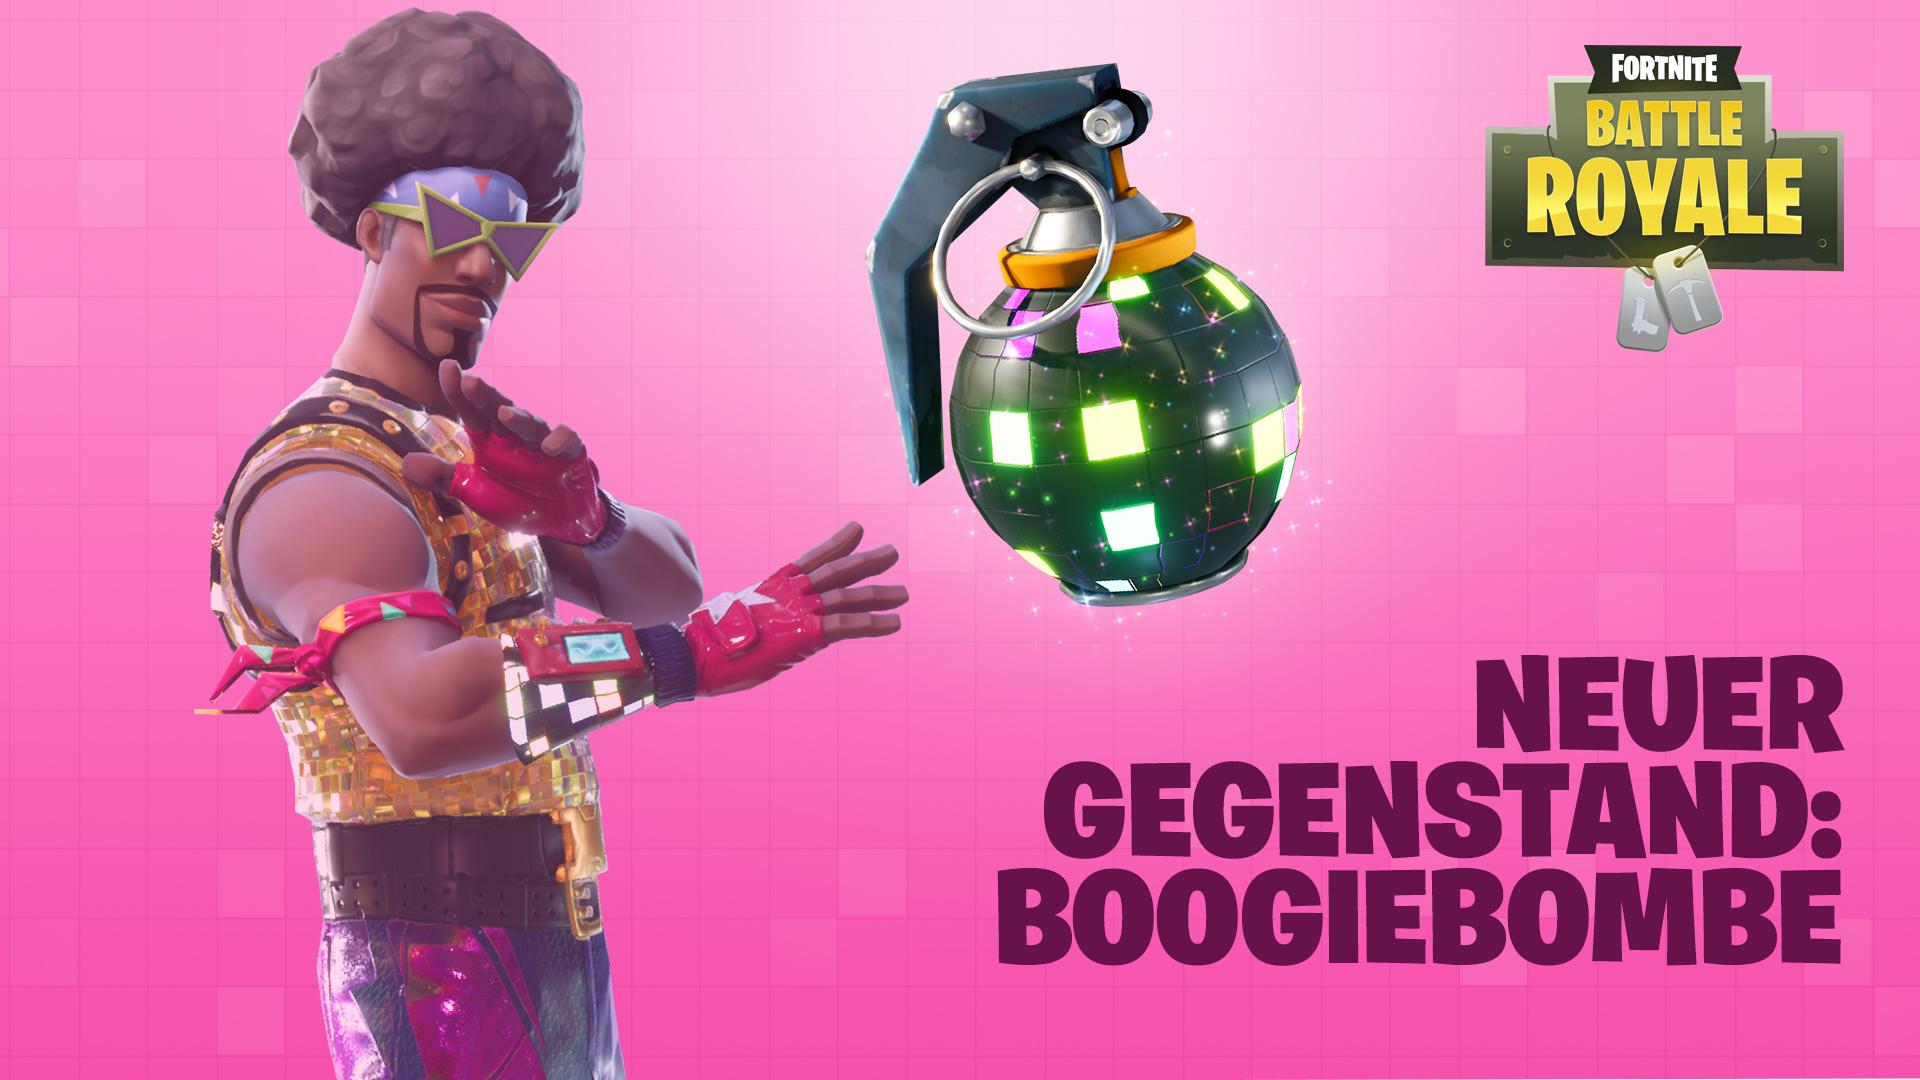 DE_BoogieBomb_YT_Thumb.jpg